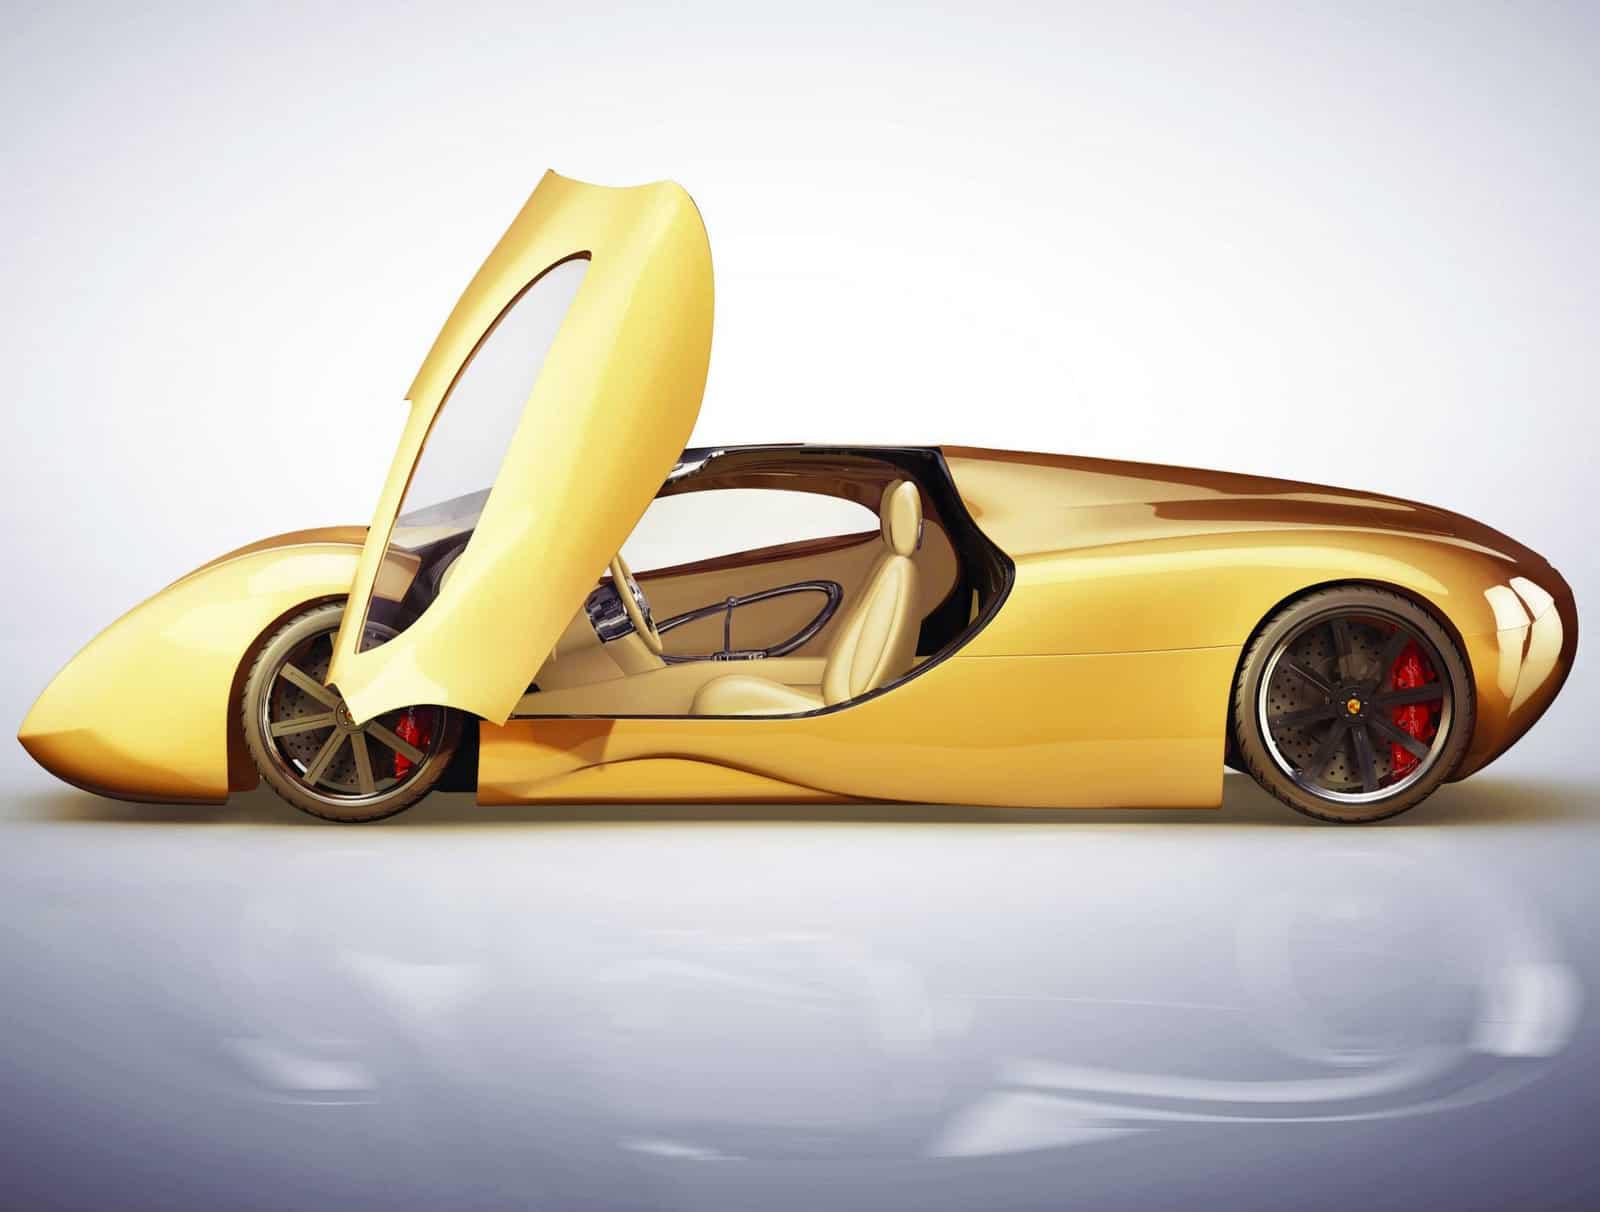 lyons motor car lm2 streamliner the real american supercar. Black Bedroom Furniture Sets. Home Design Ideas